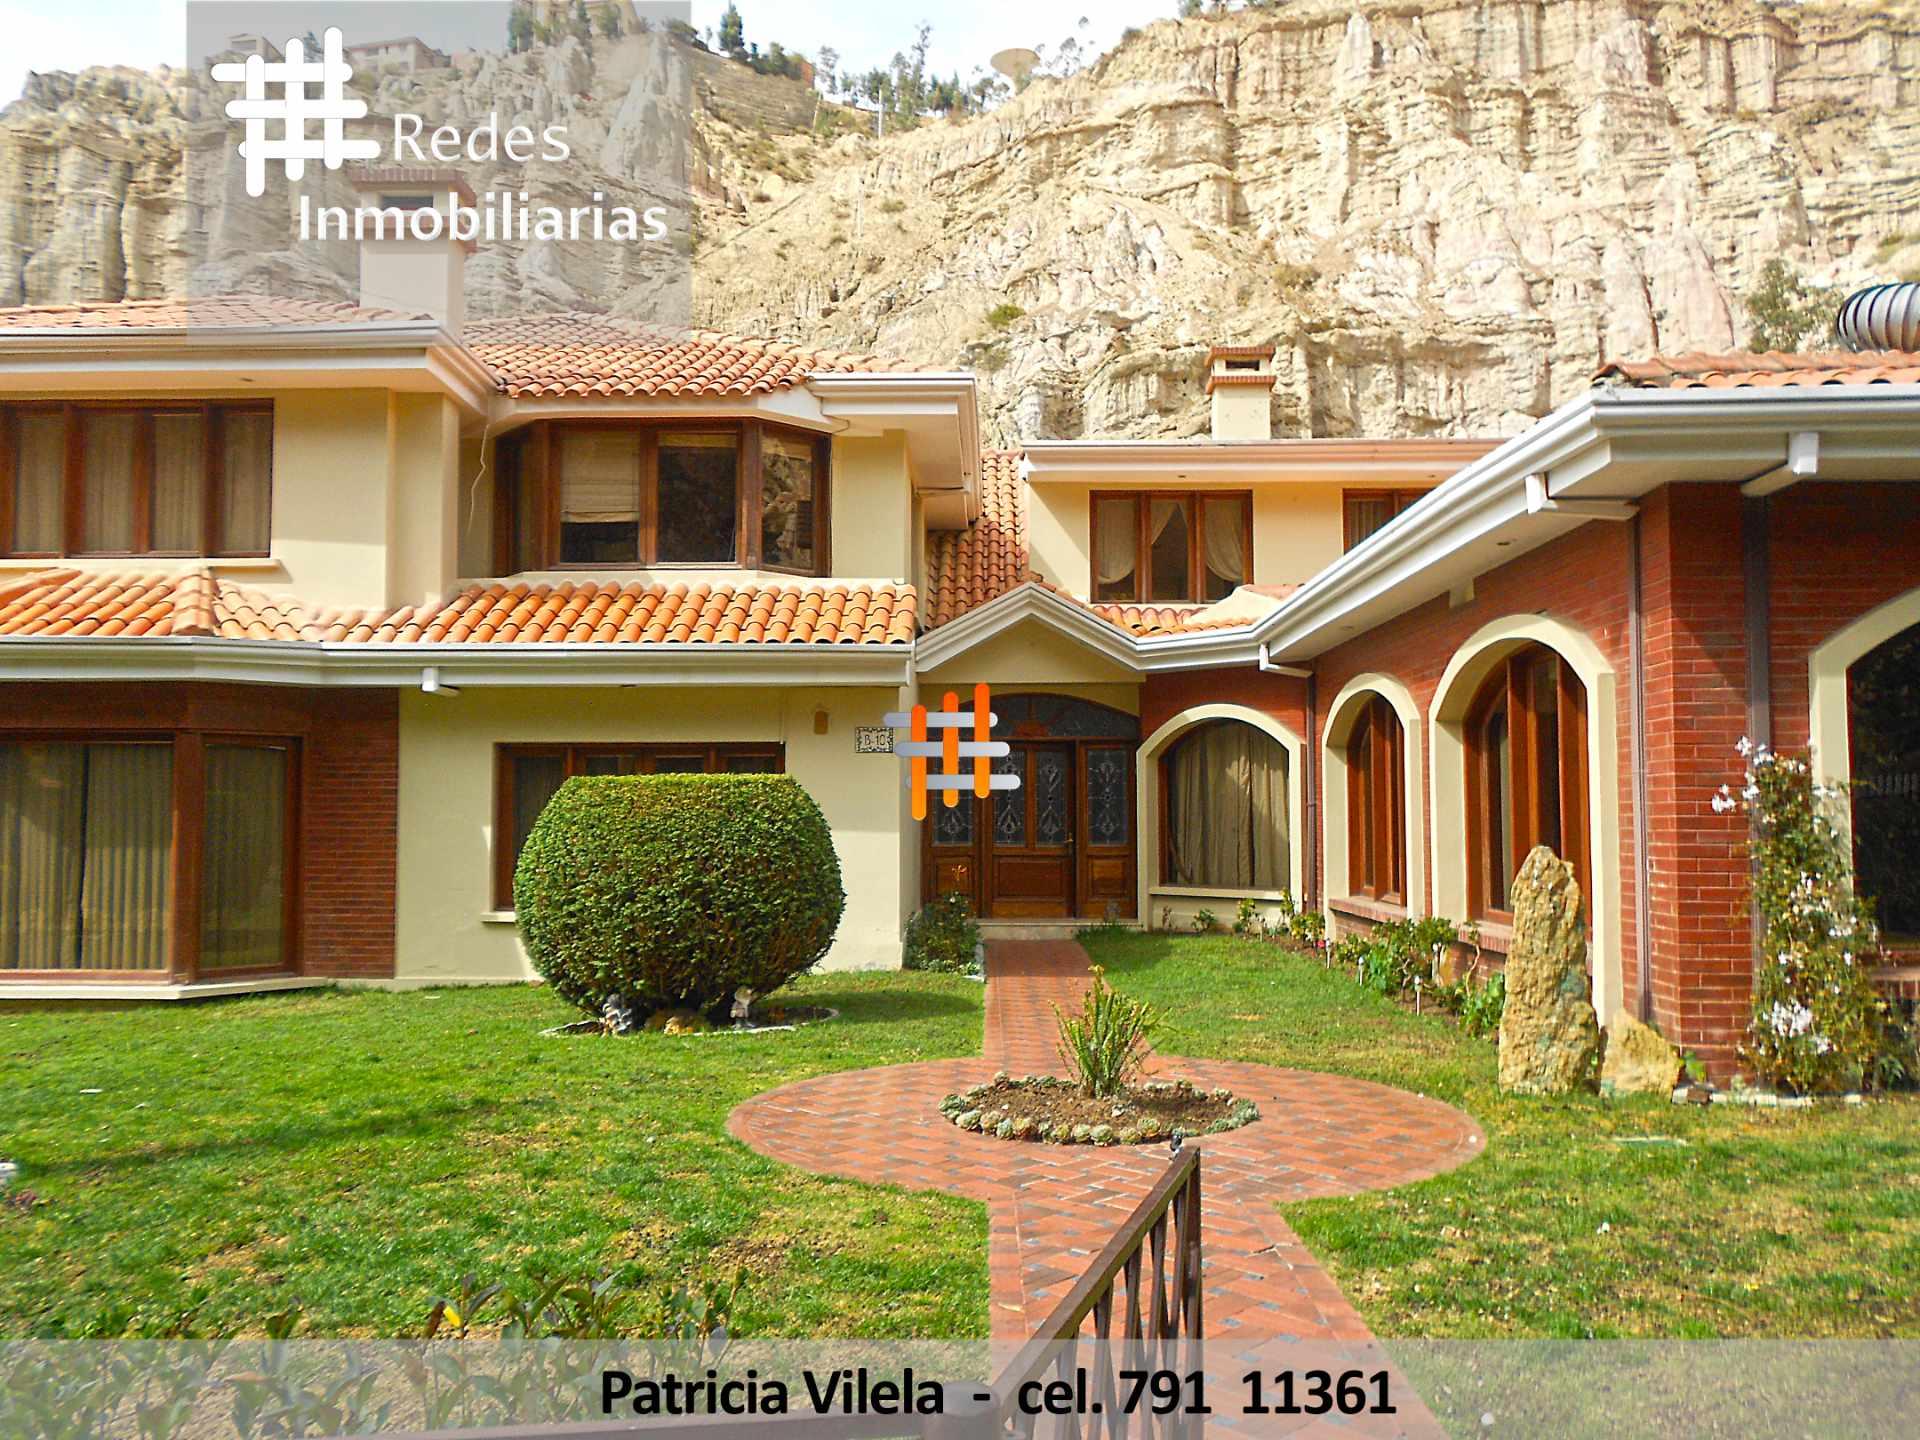 Casa en Alquiler HERMOSA RESIDENCIA EN ALQUILER  ...ARANJUEZ Foto 1